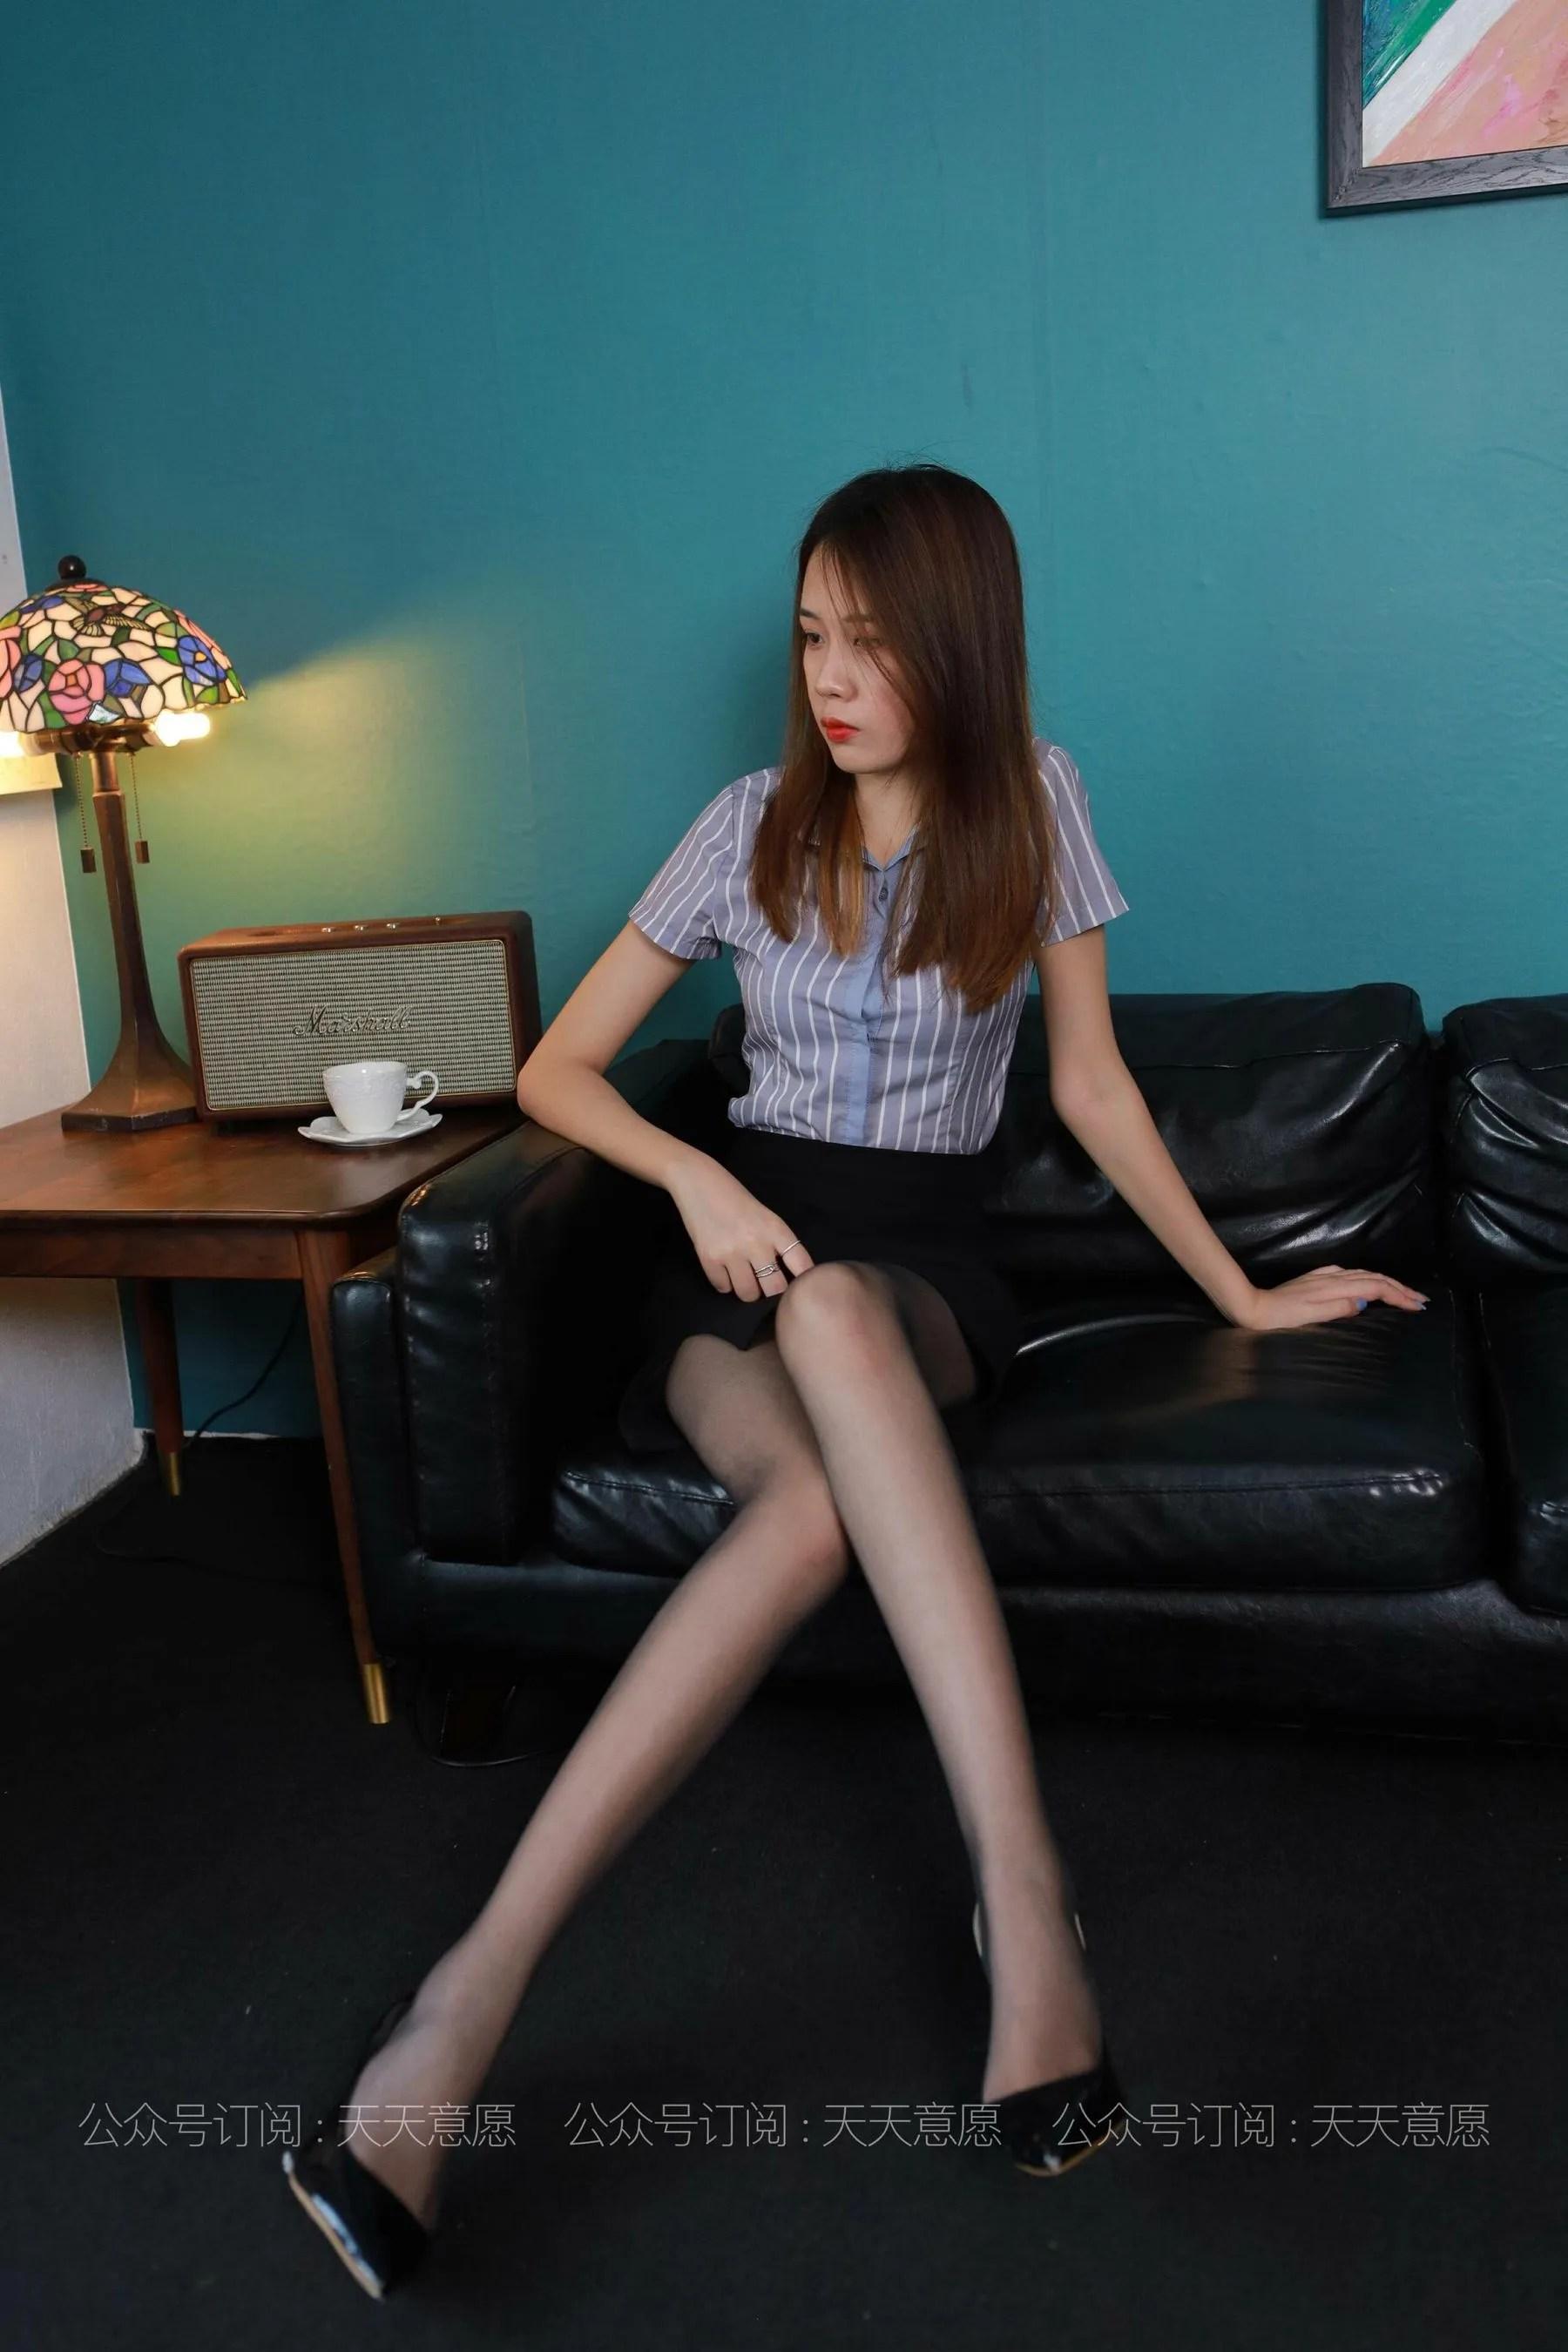 [IESS] 丝享家816: 西瓜《美腿细长直》[92P]插图(3)